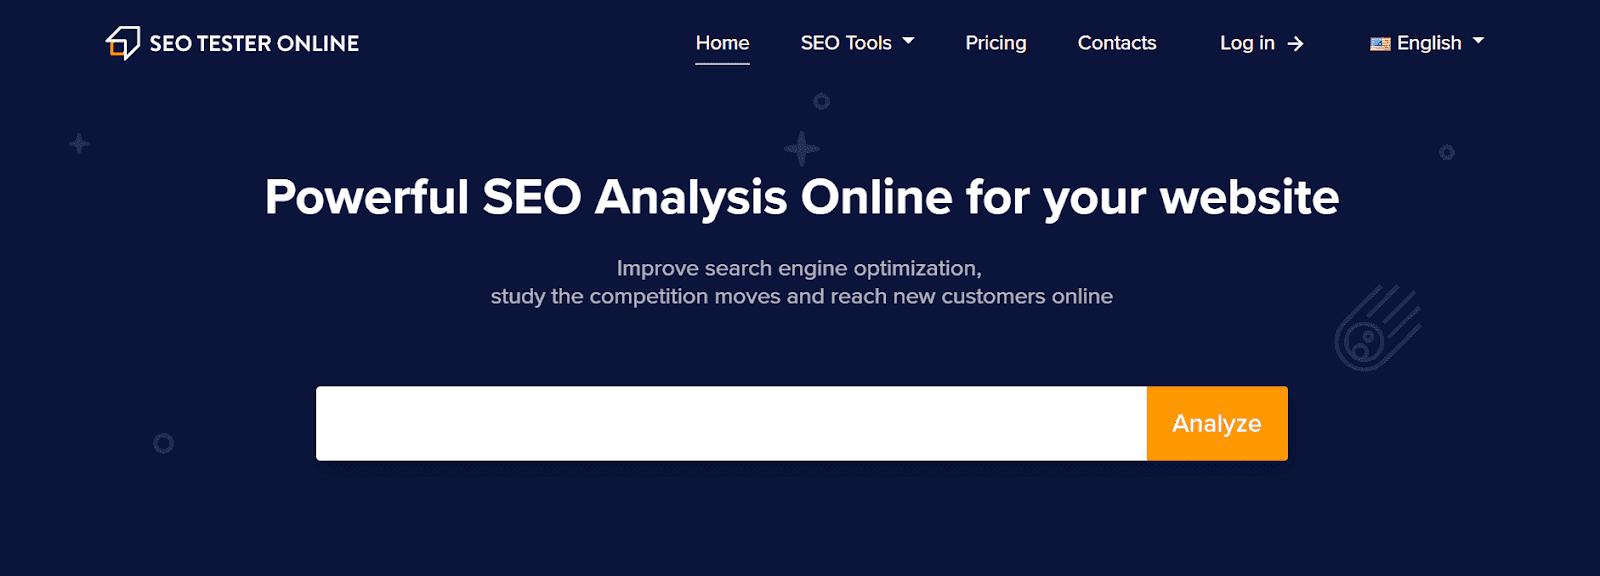 free seo optimizer tools